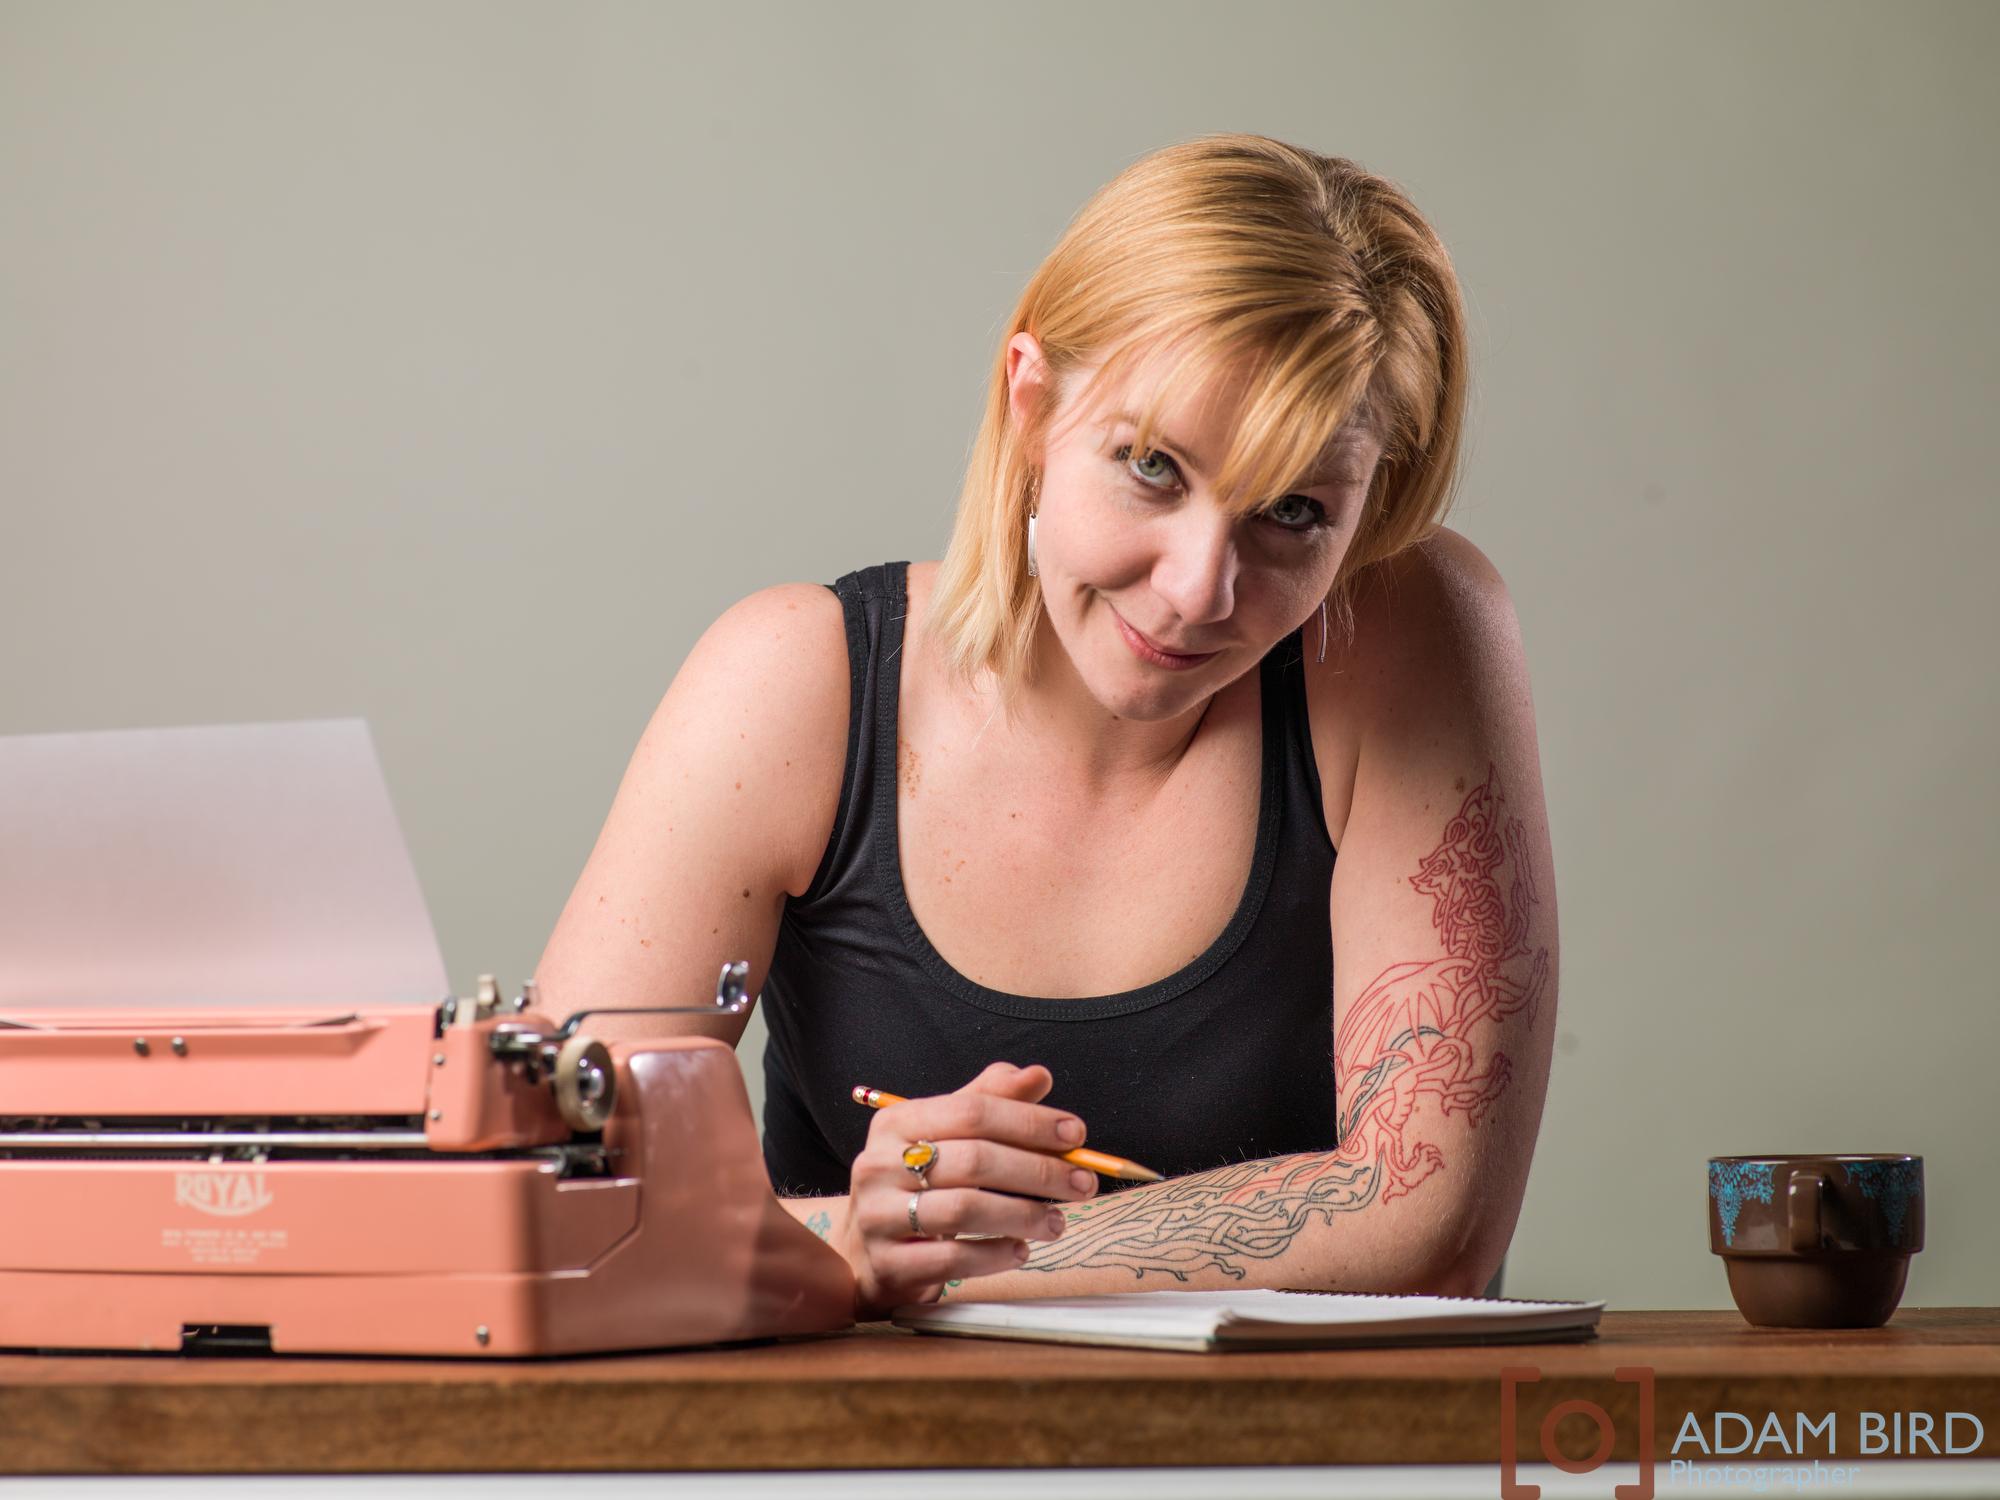 Marjorie Steele writing in the studio